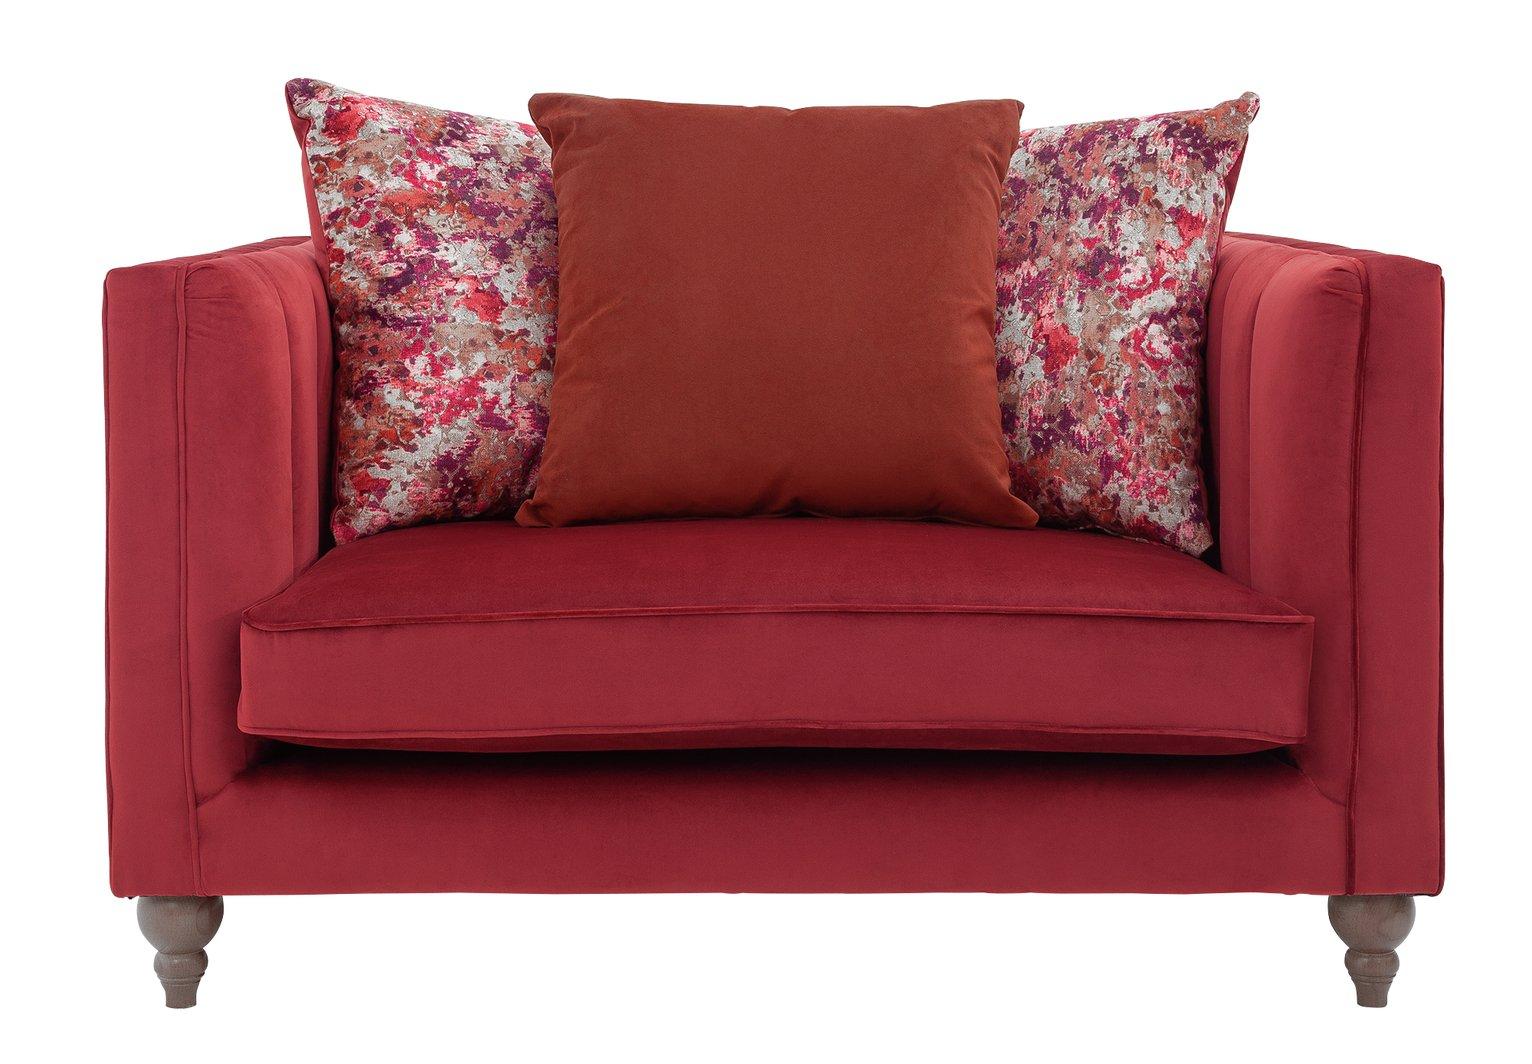 Argos Home Bardot Velvet Cuddle Chair - Cranberry